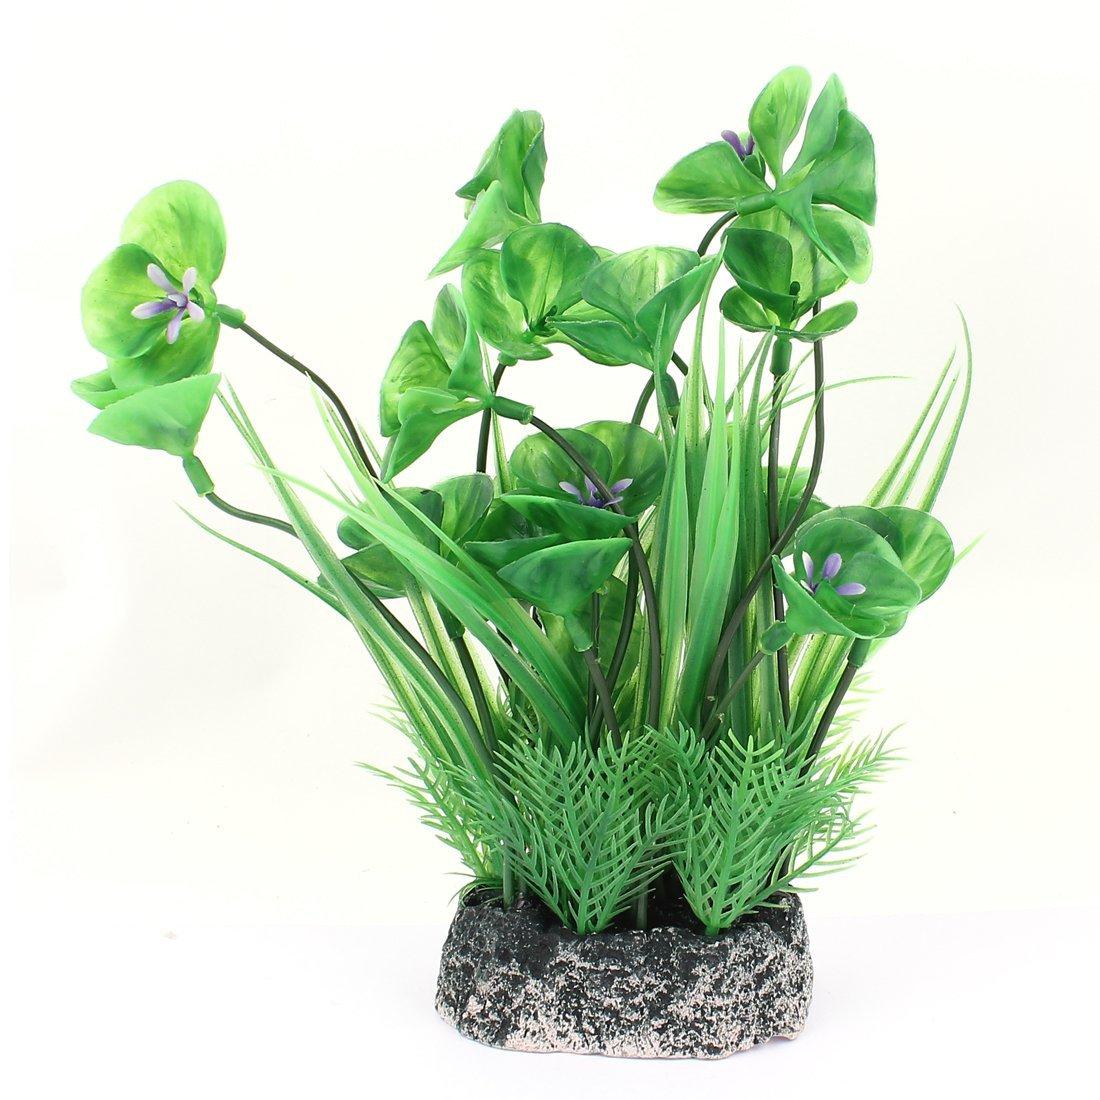 1Pc 10-Piece Plastic Aquarium Plants Decoration, 4.1-Inch, Light Green